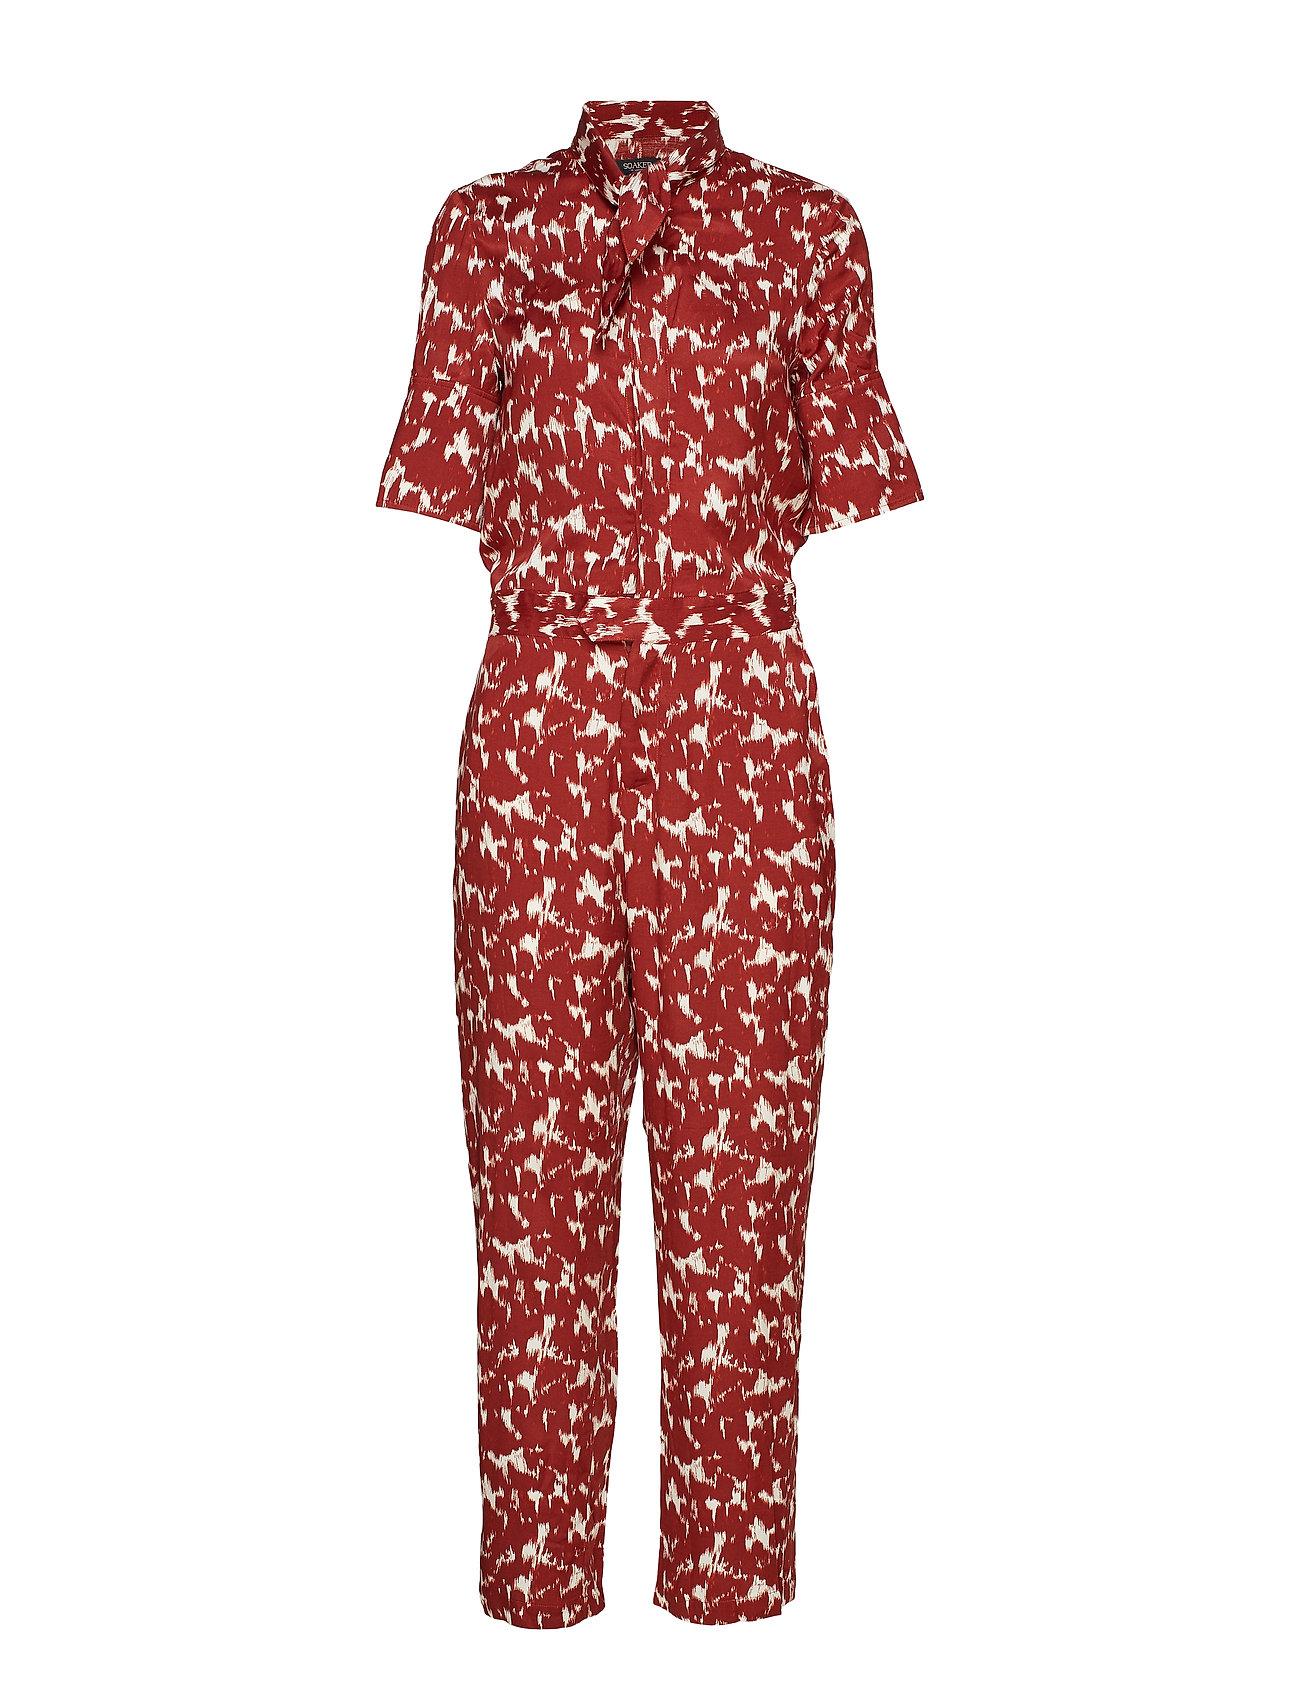 Soaked in Luxury SLZaldana Jumpsuit Print - FIRED BRICK PRINT